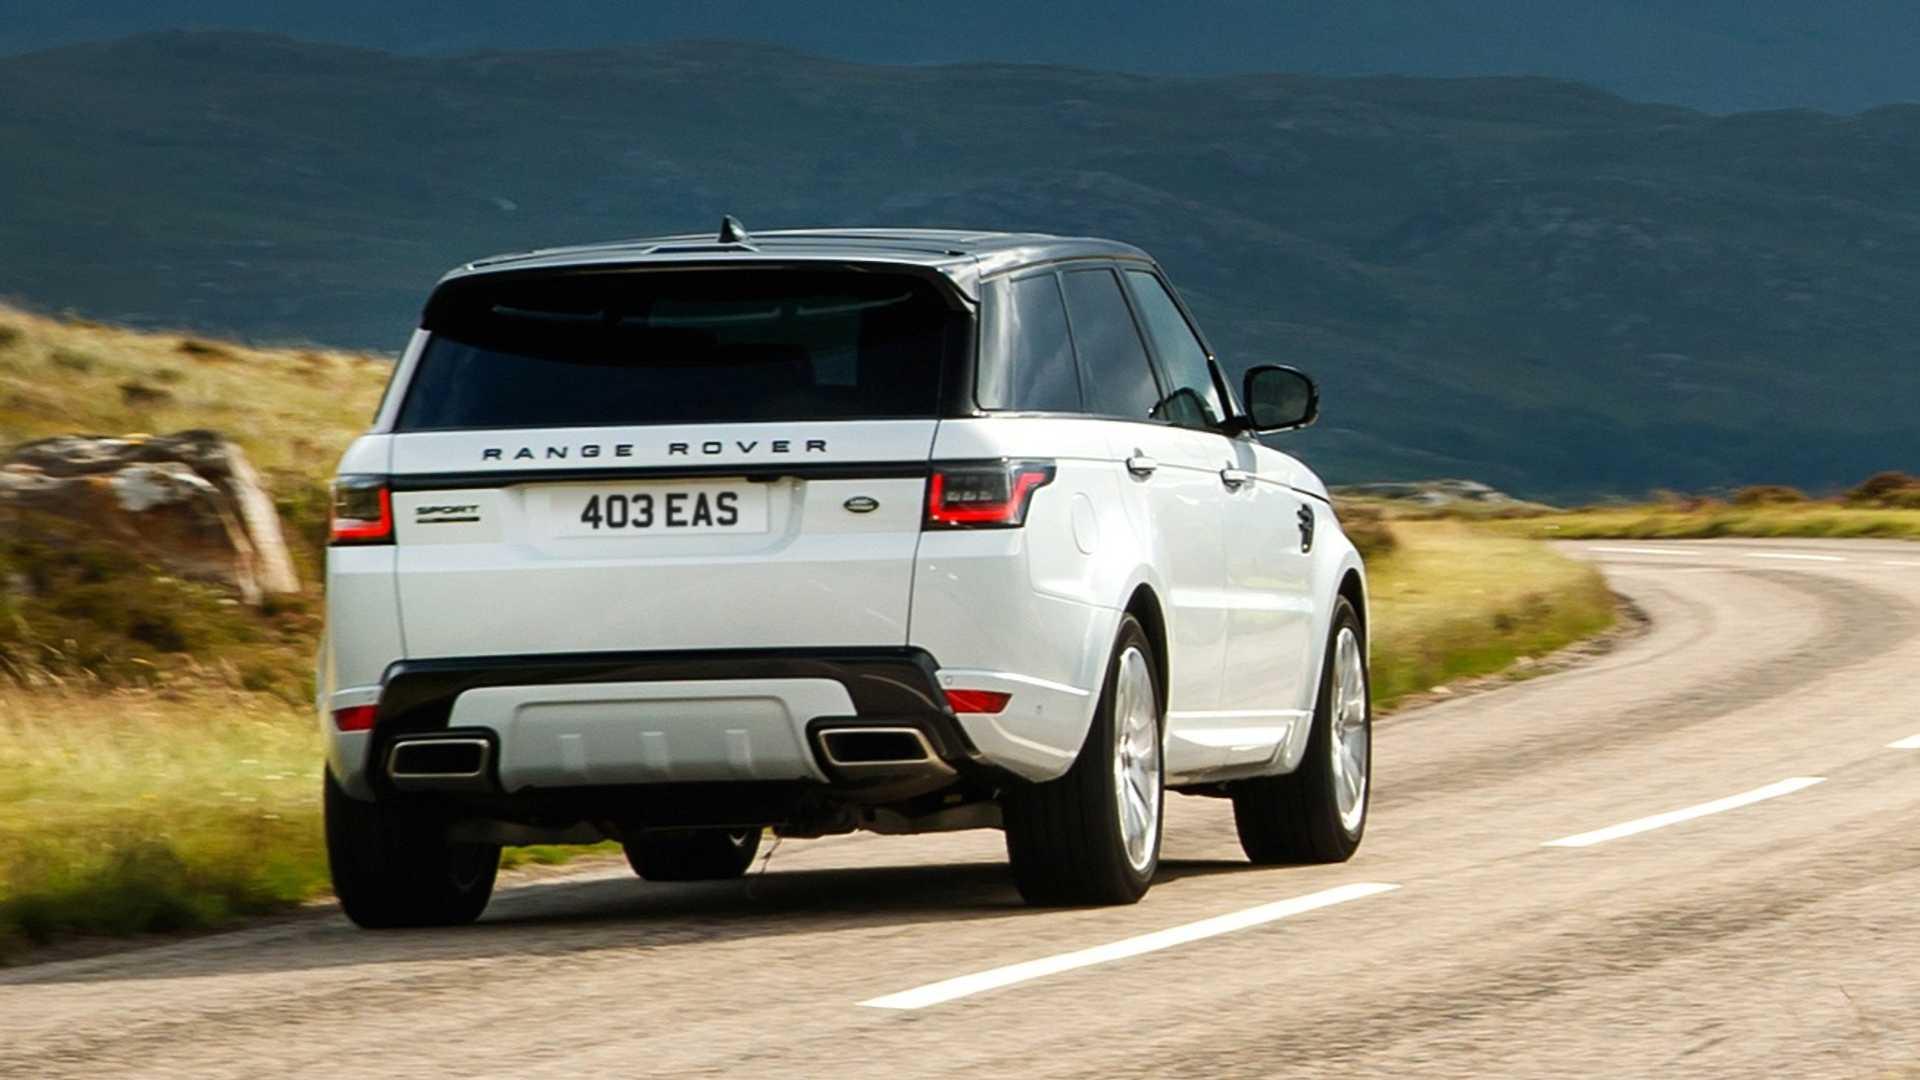 land rover range rover sport 2021 3 لندروور رکورد تولید یک میلیون دستگاه رنج روور اسپرت را شکست اخبار IT